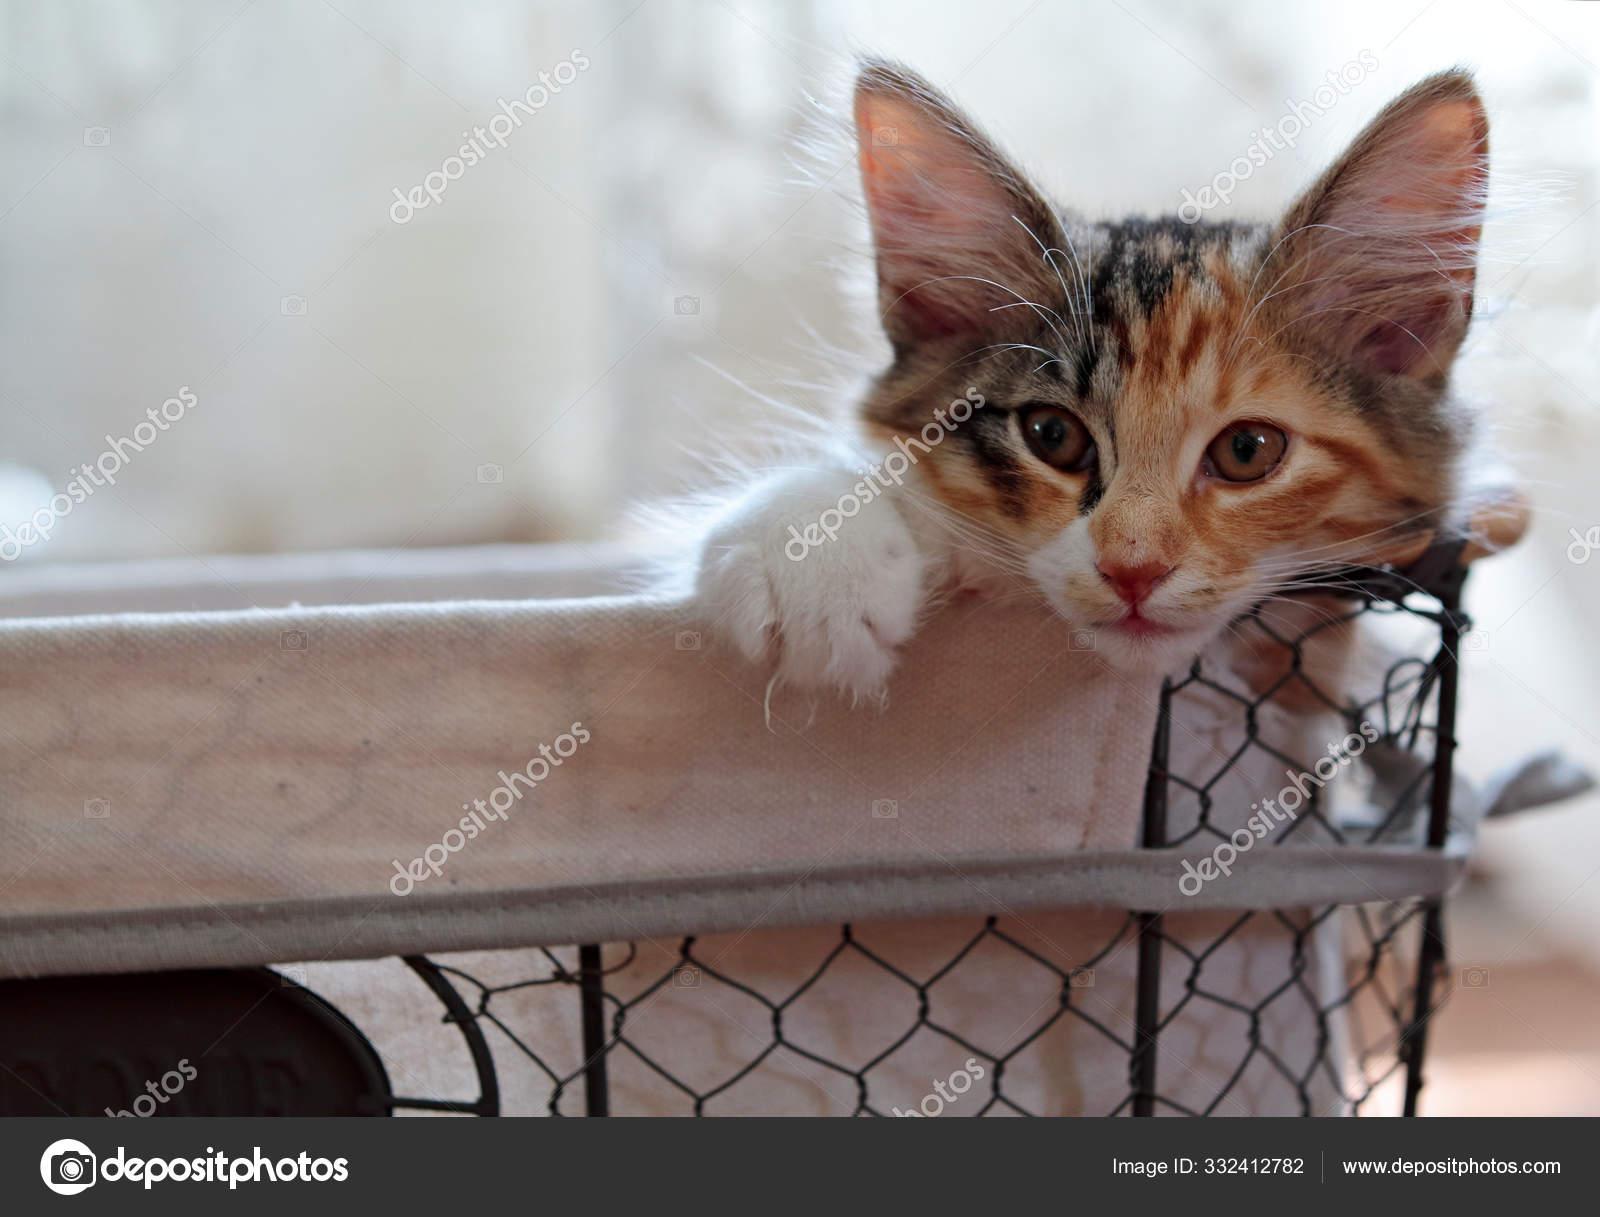 A Norwegian Forest Cat Kitten In A Basket Stock Photo C Puteli 332412782